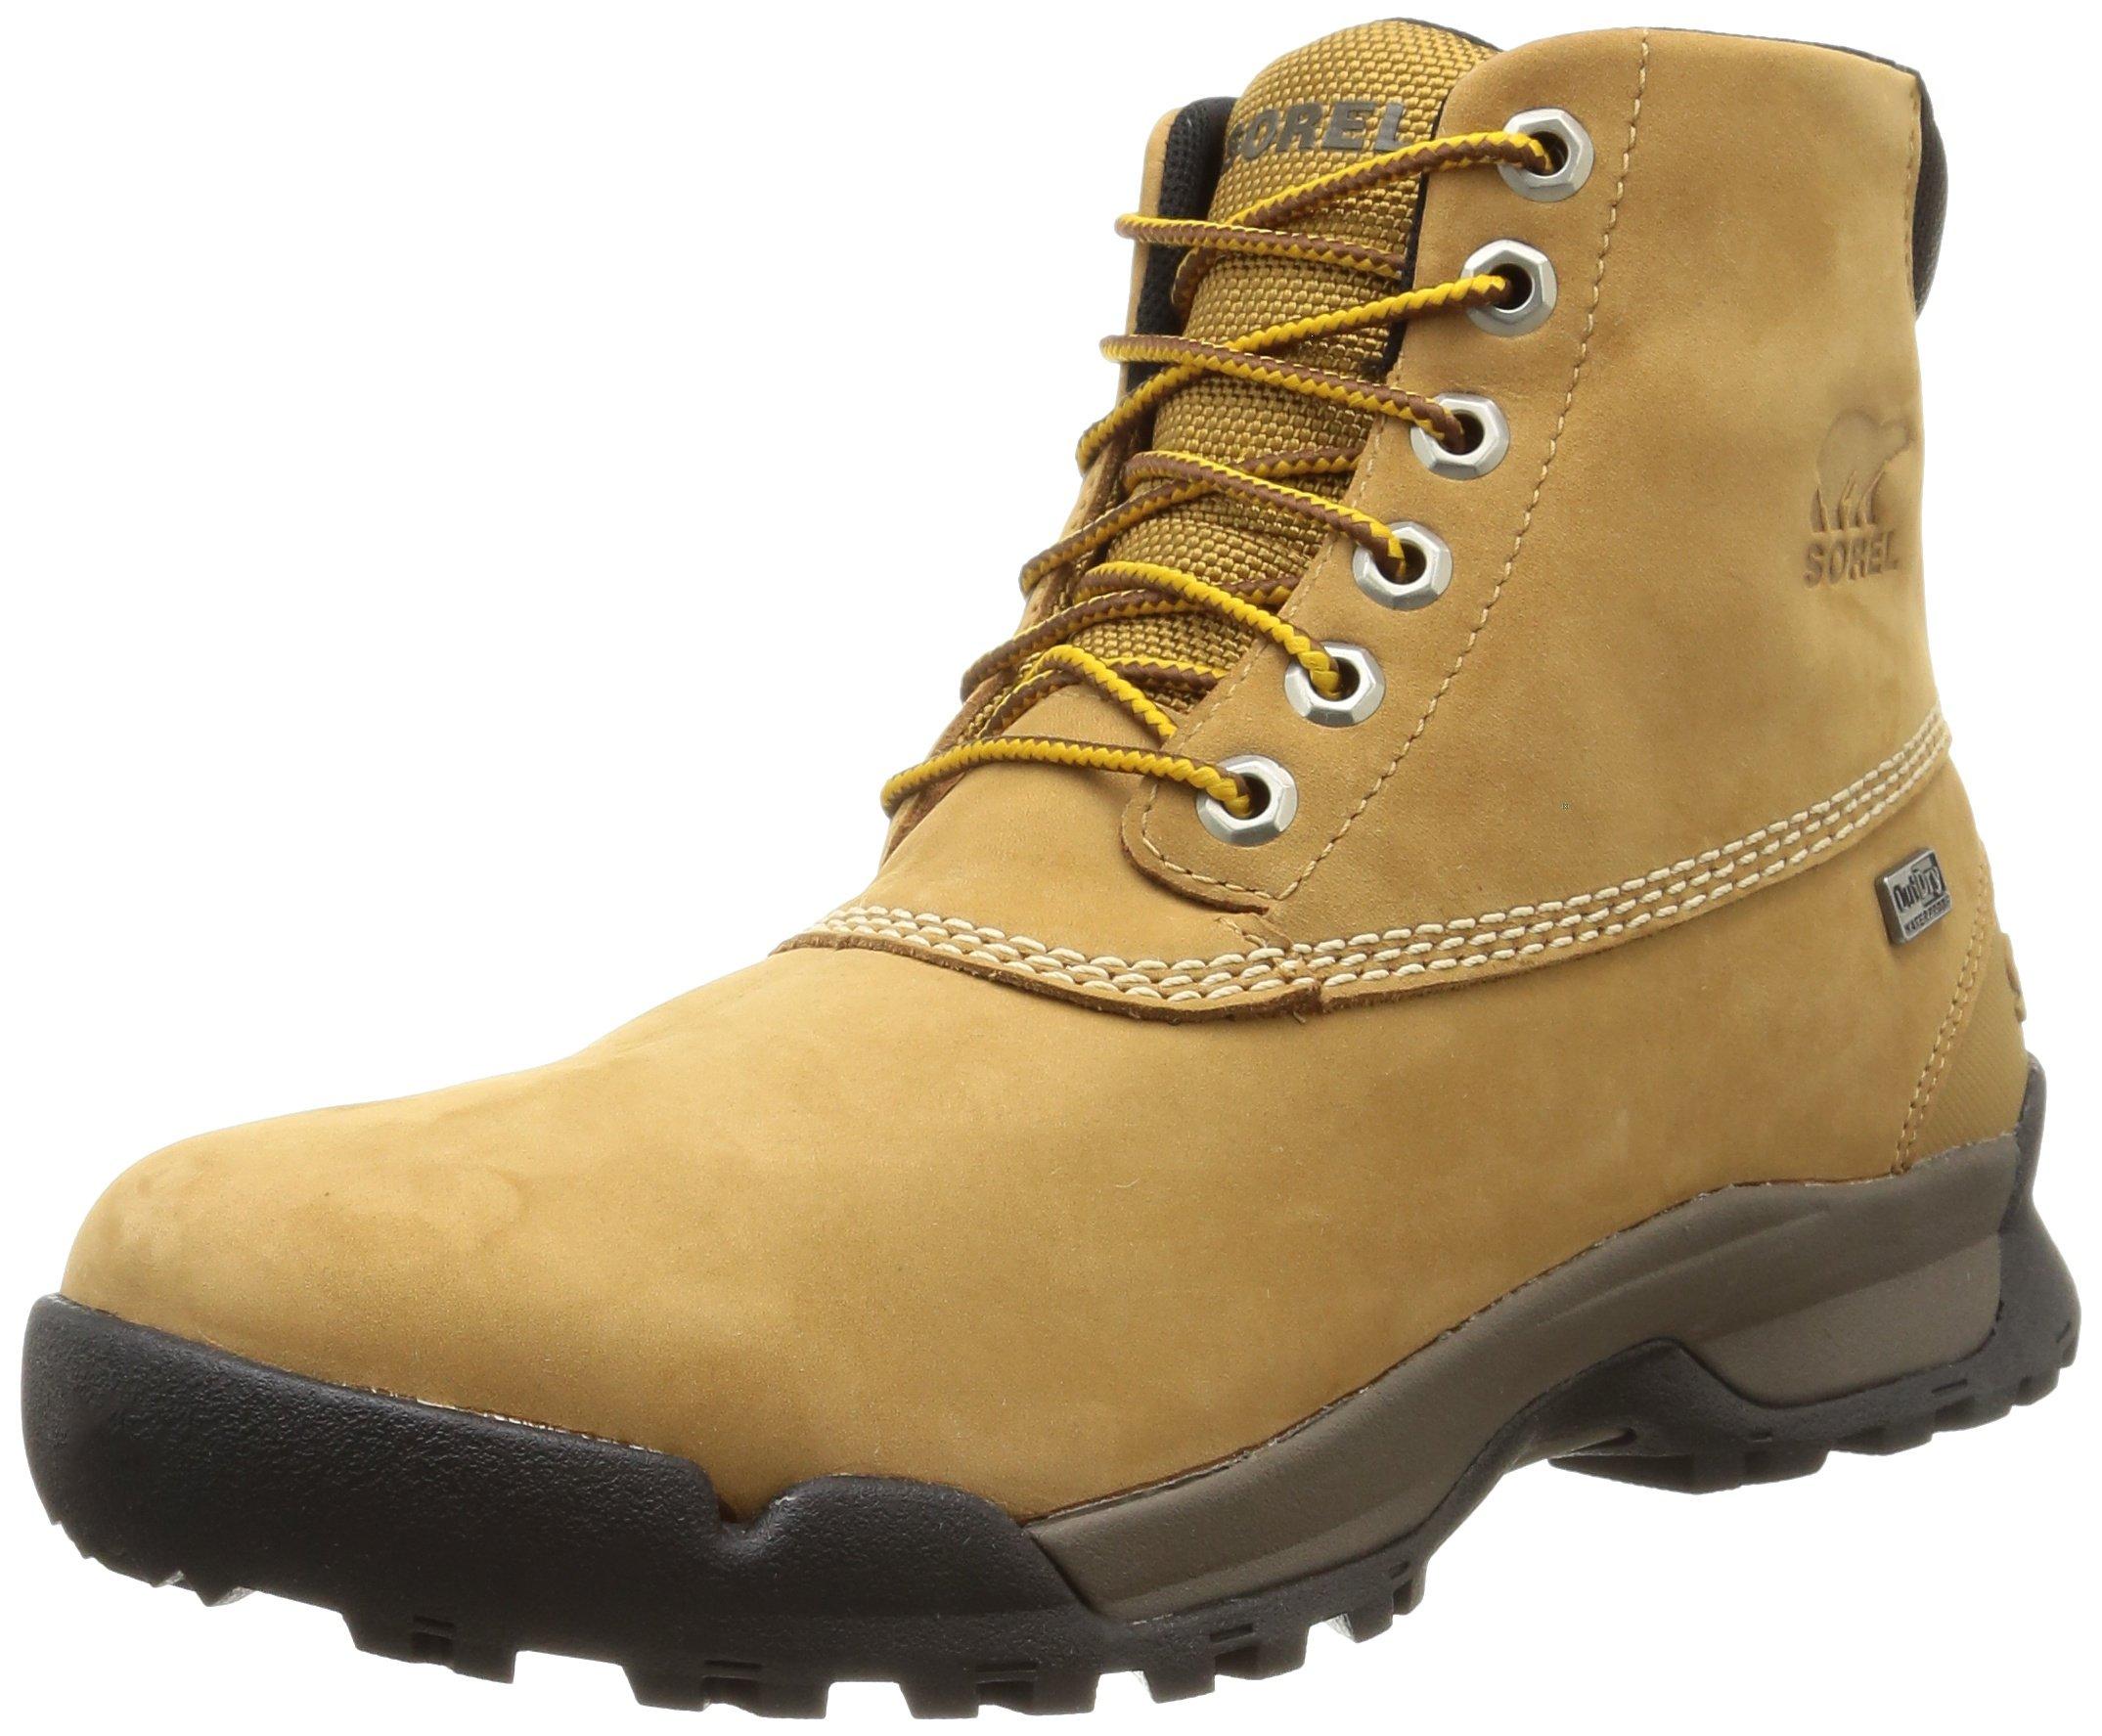 SOREL Men's Paxson 6'' Outdry Snow Boot, Buff, Major, 9 D US